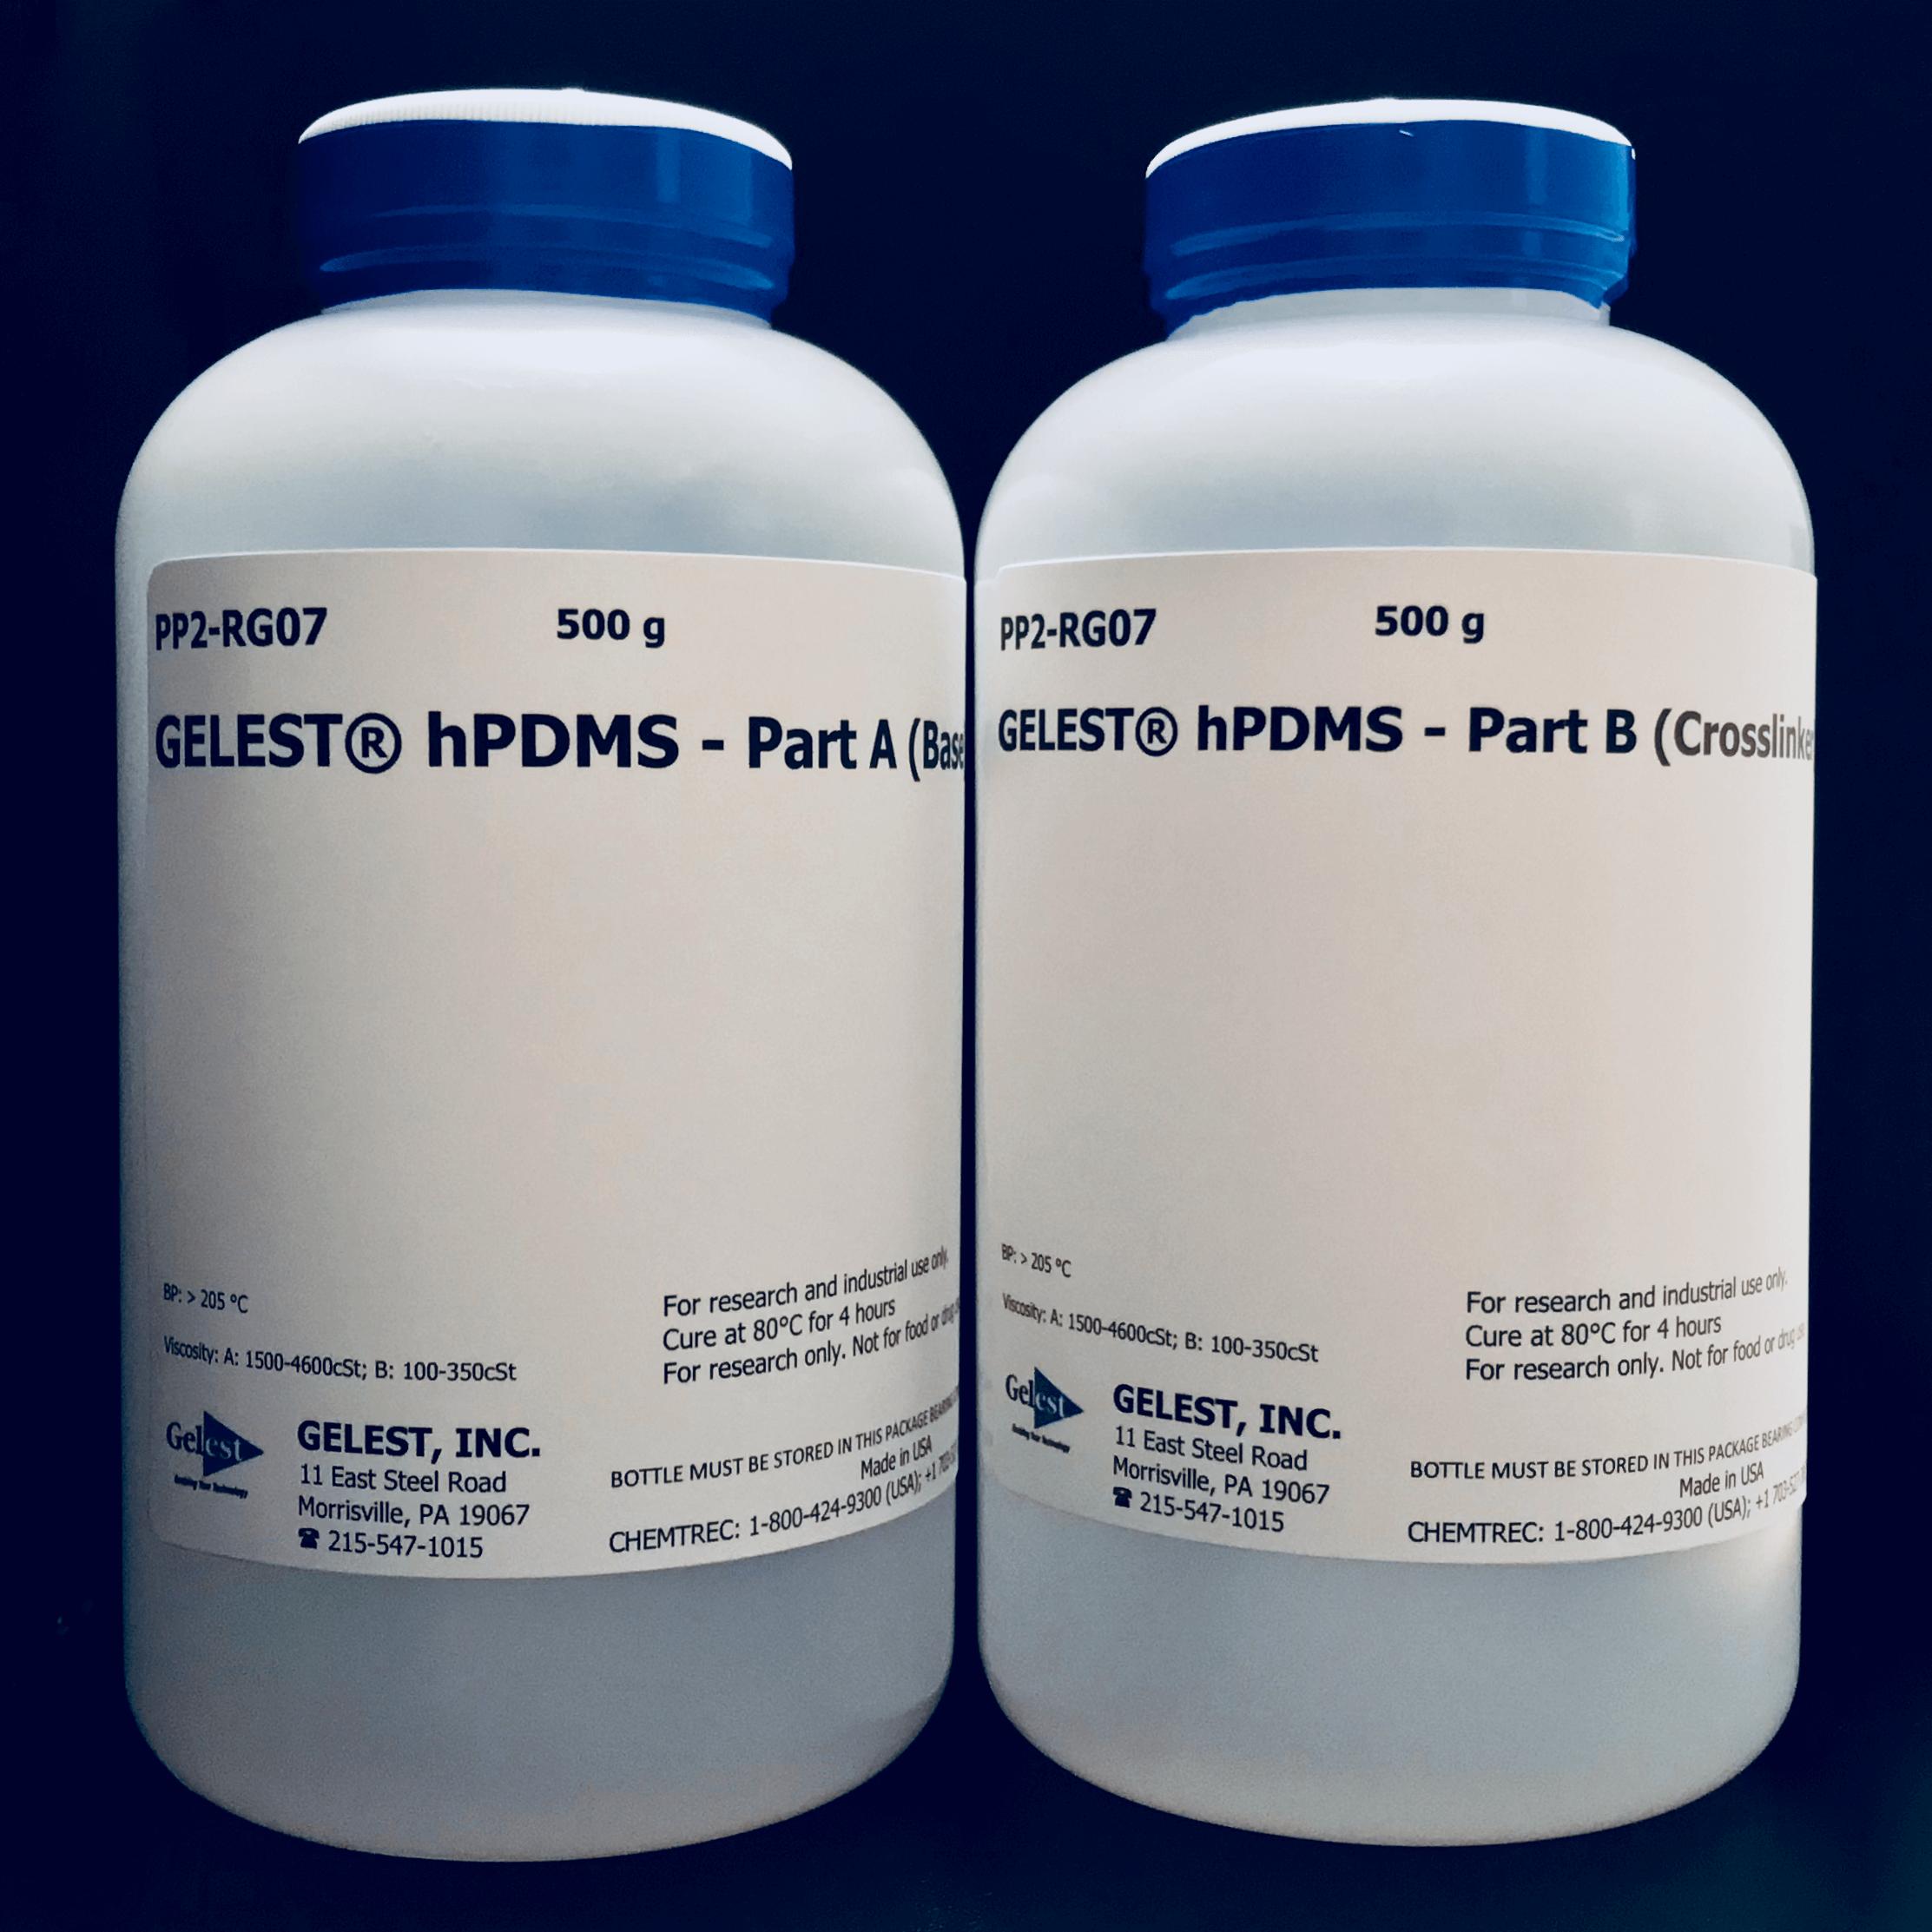 GELEST® hPDMS: HIGH MODULUS REPROGRAPHIC SILICONE 1kg Kit; Part B (Crosslinker)